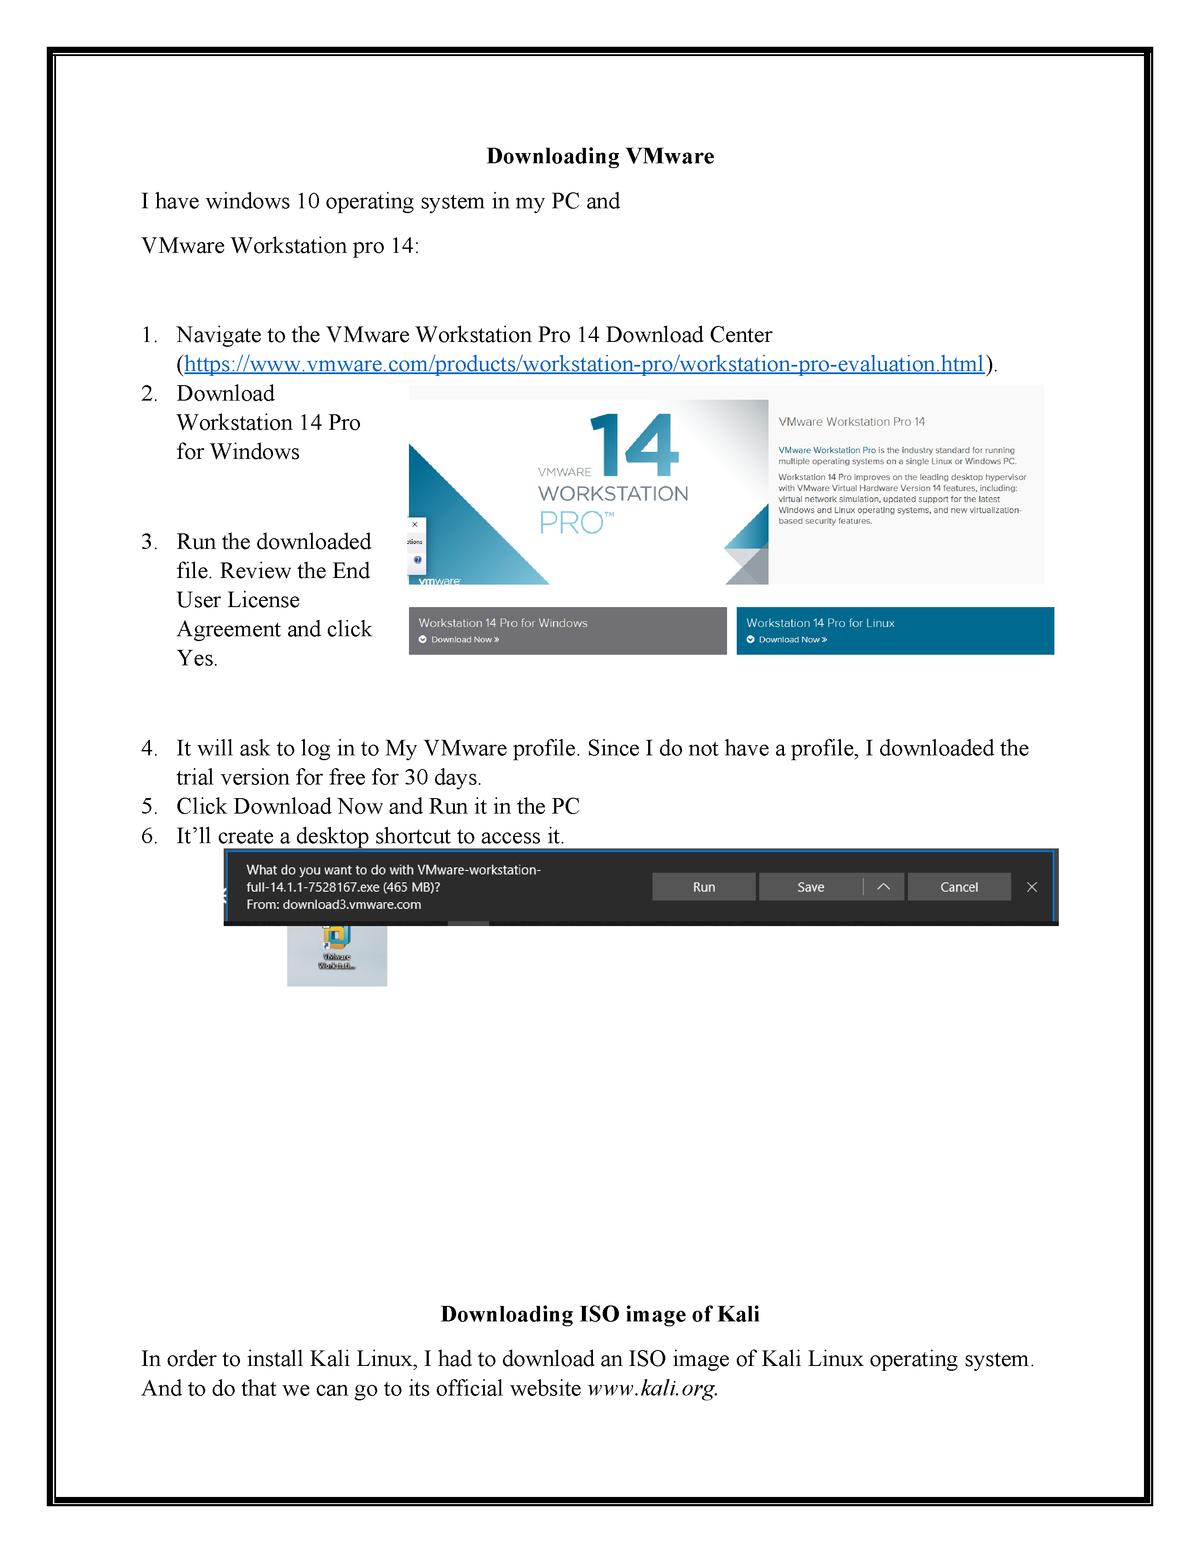 Exam 2018 - CMIT 391: Linux System Administration - StuDocu